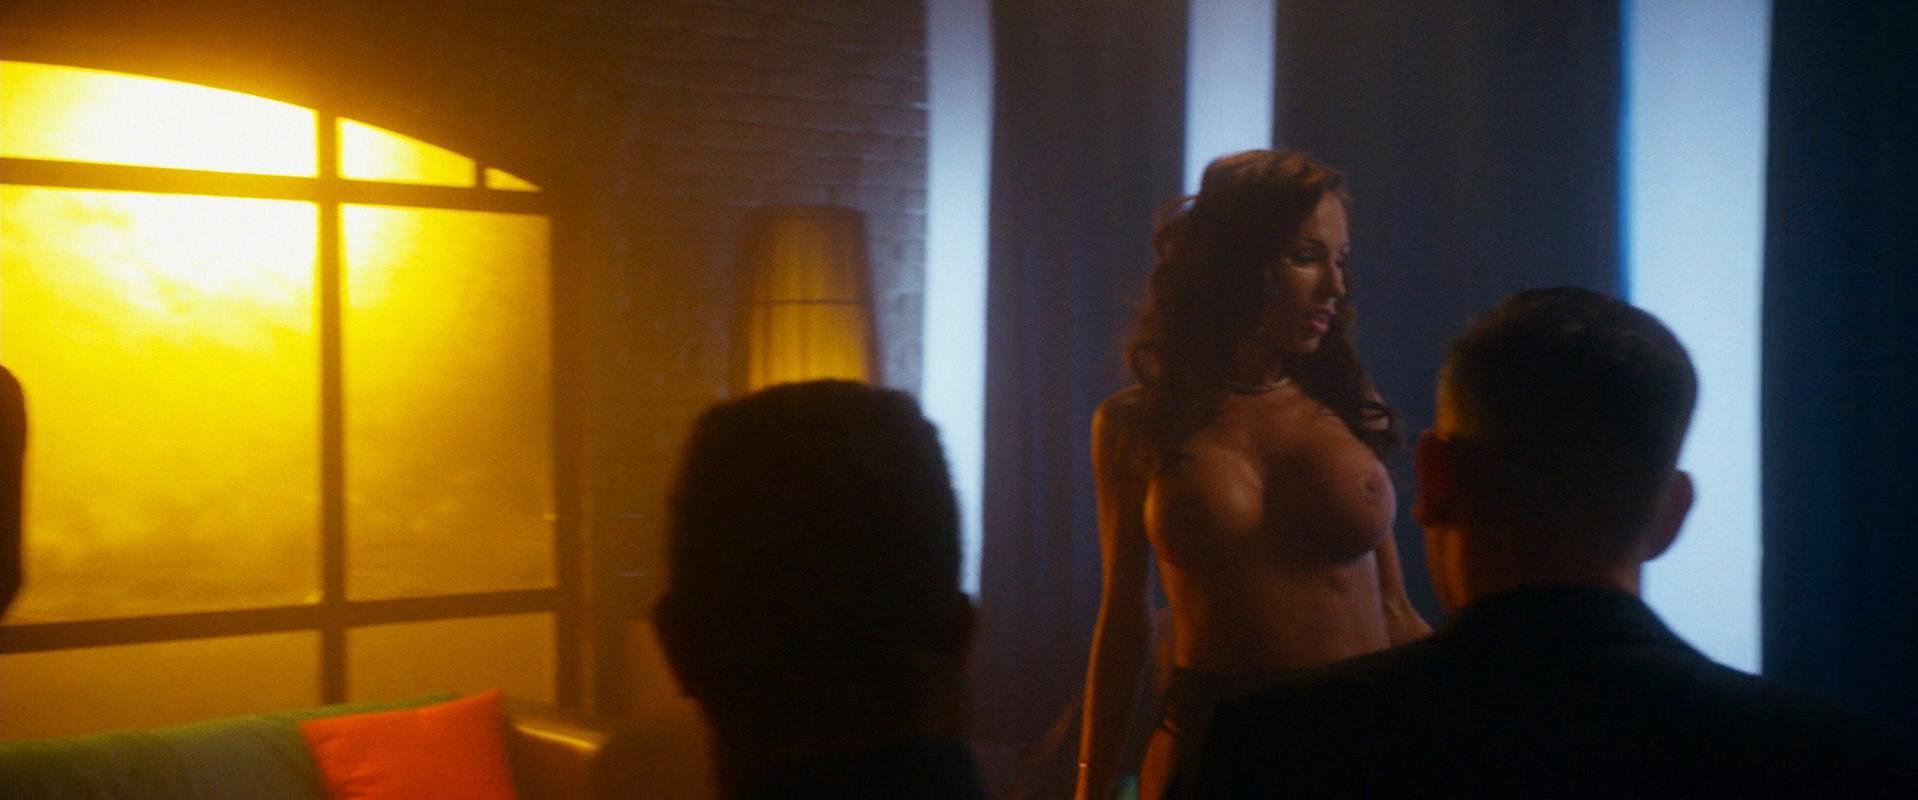 Aria London nude - Vice (2015)